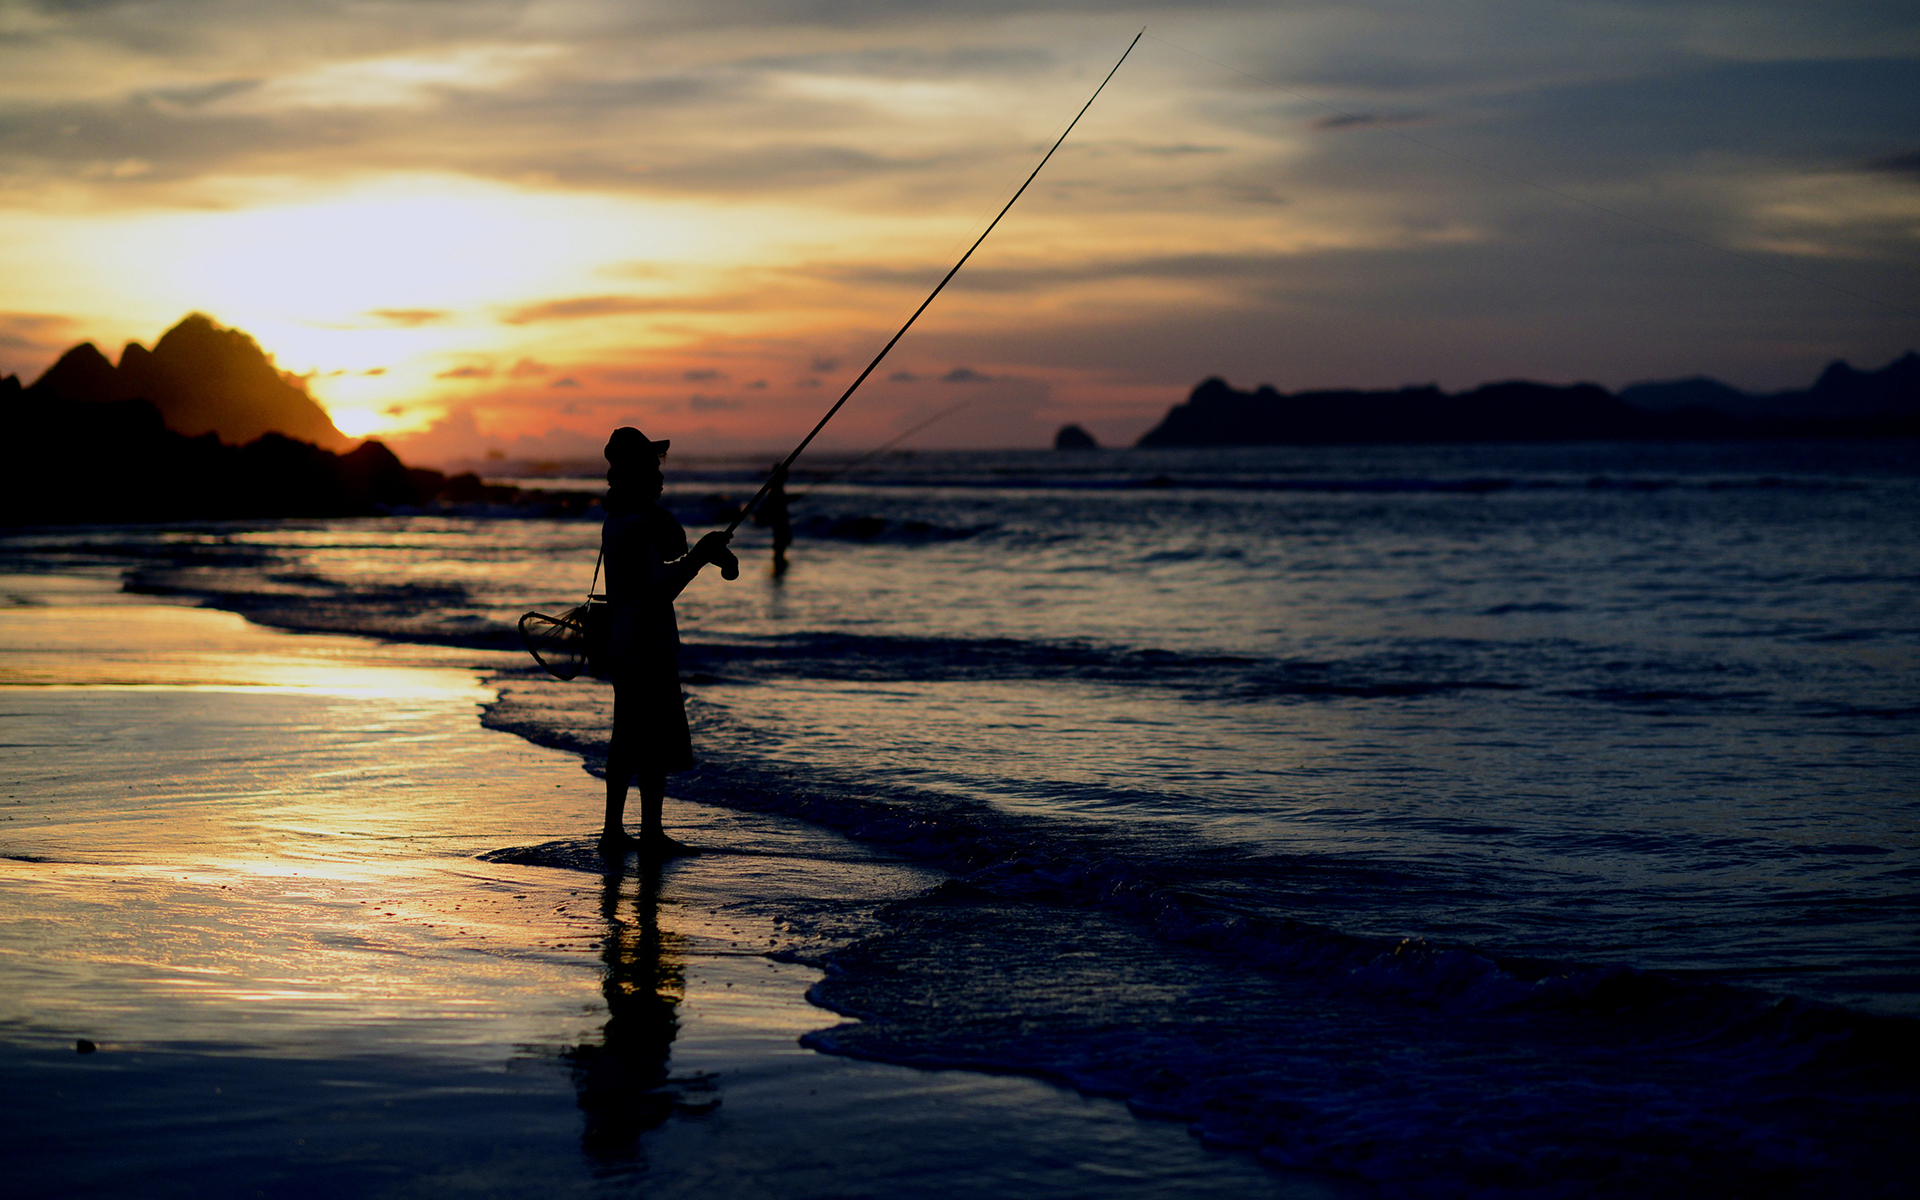 Beach Ocean Sunset people fishing sea waves wallpaper background 1920x1200